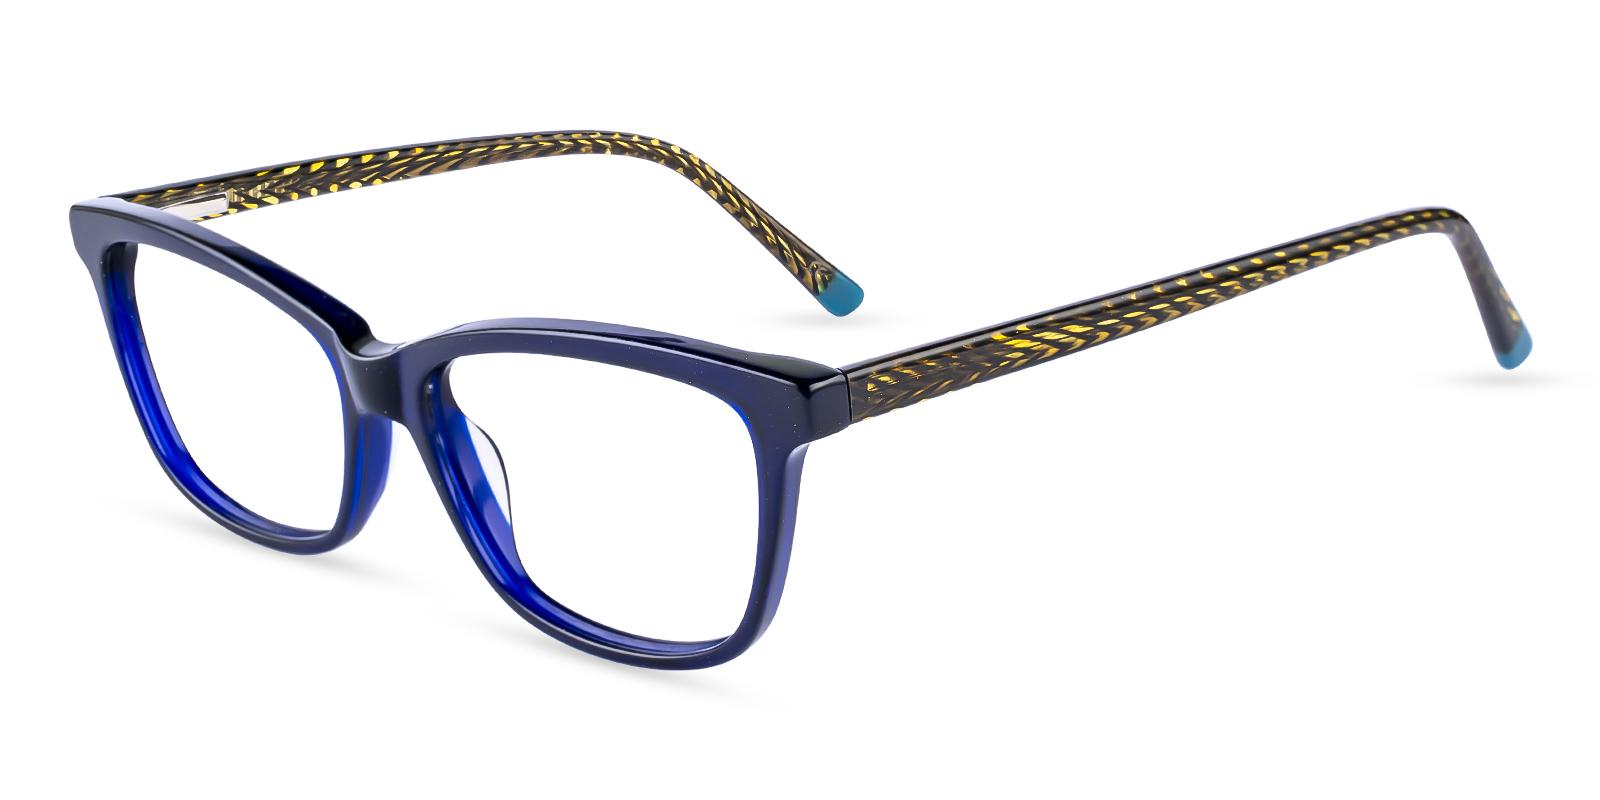 Zion Blue Acetate Eyeglasses , SpringHinges , UniversalBridgeFit Frames from ABBE Glasses